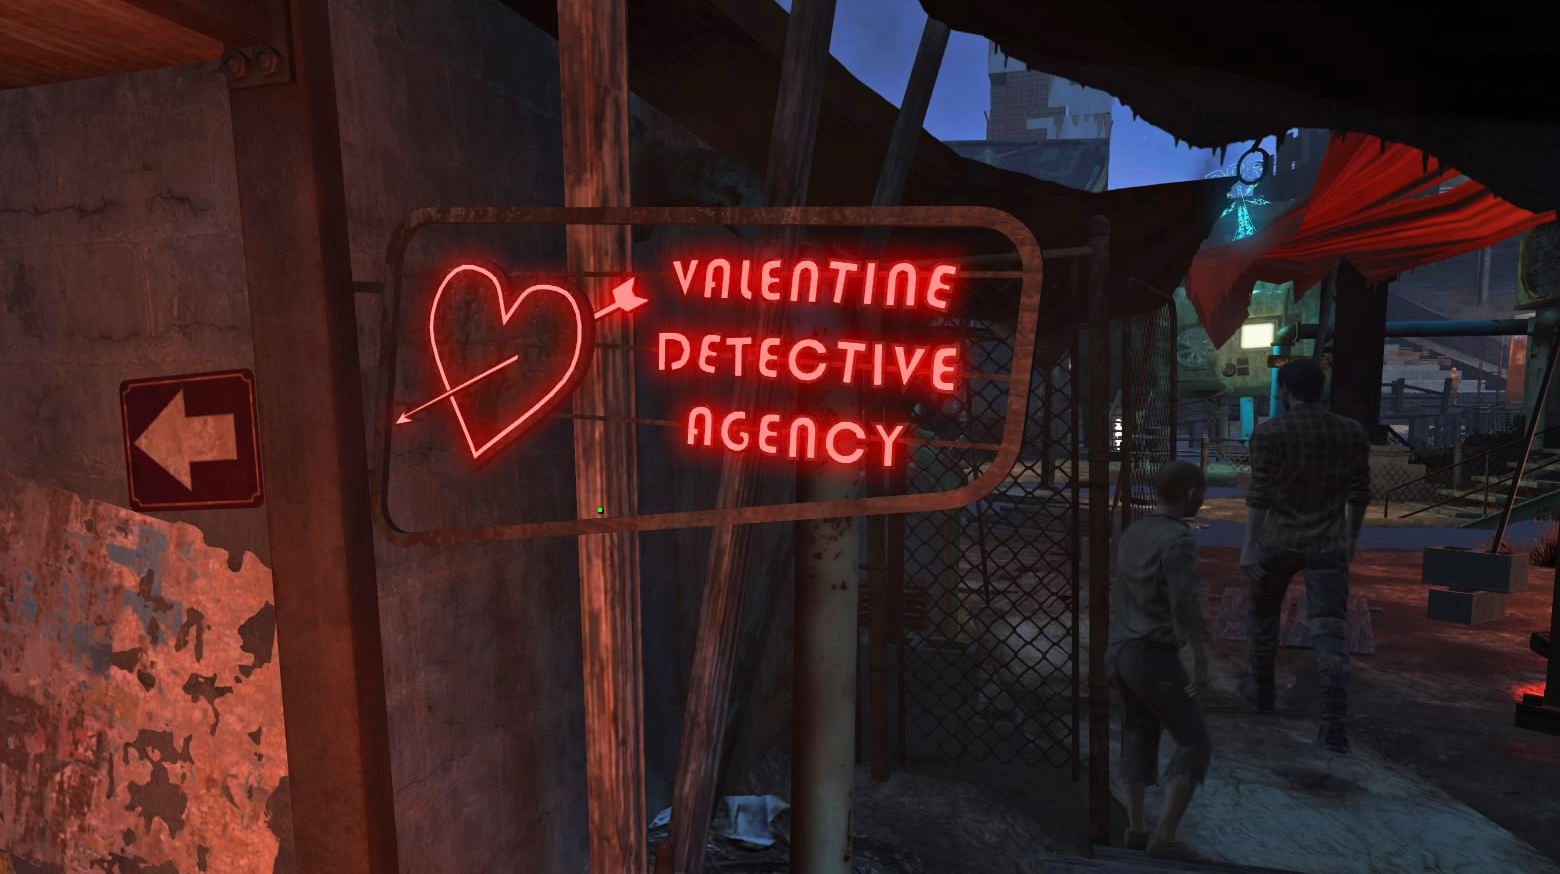 Fallout 4 detective